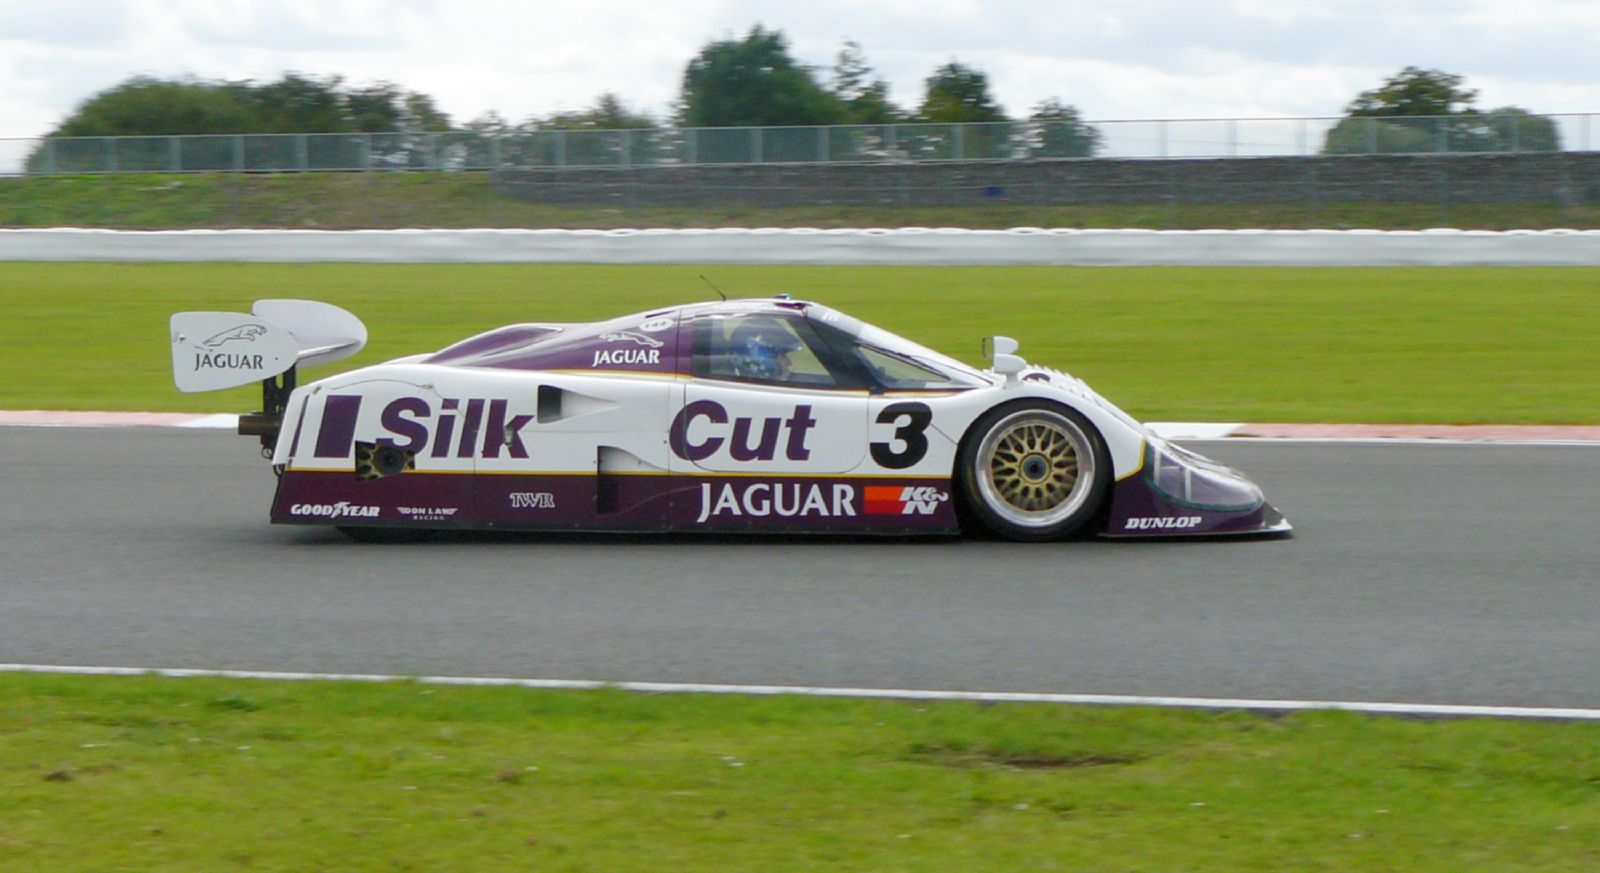 silk cut jaguar side profile dynamic track action